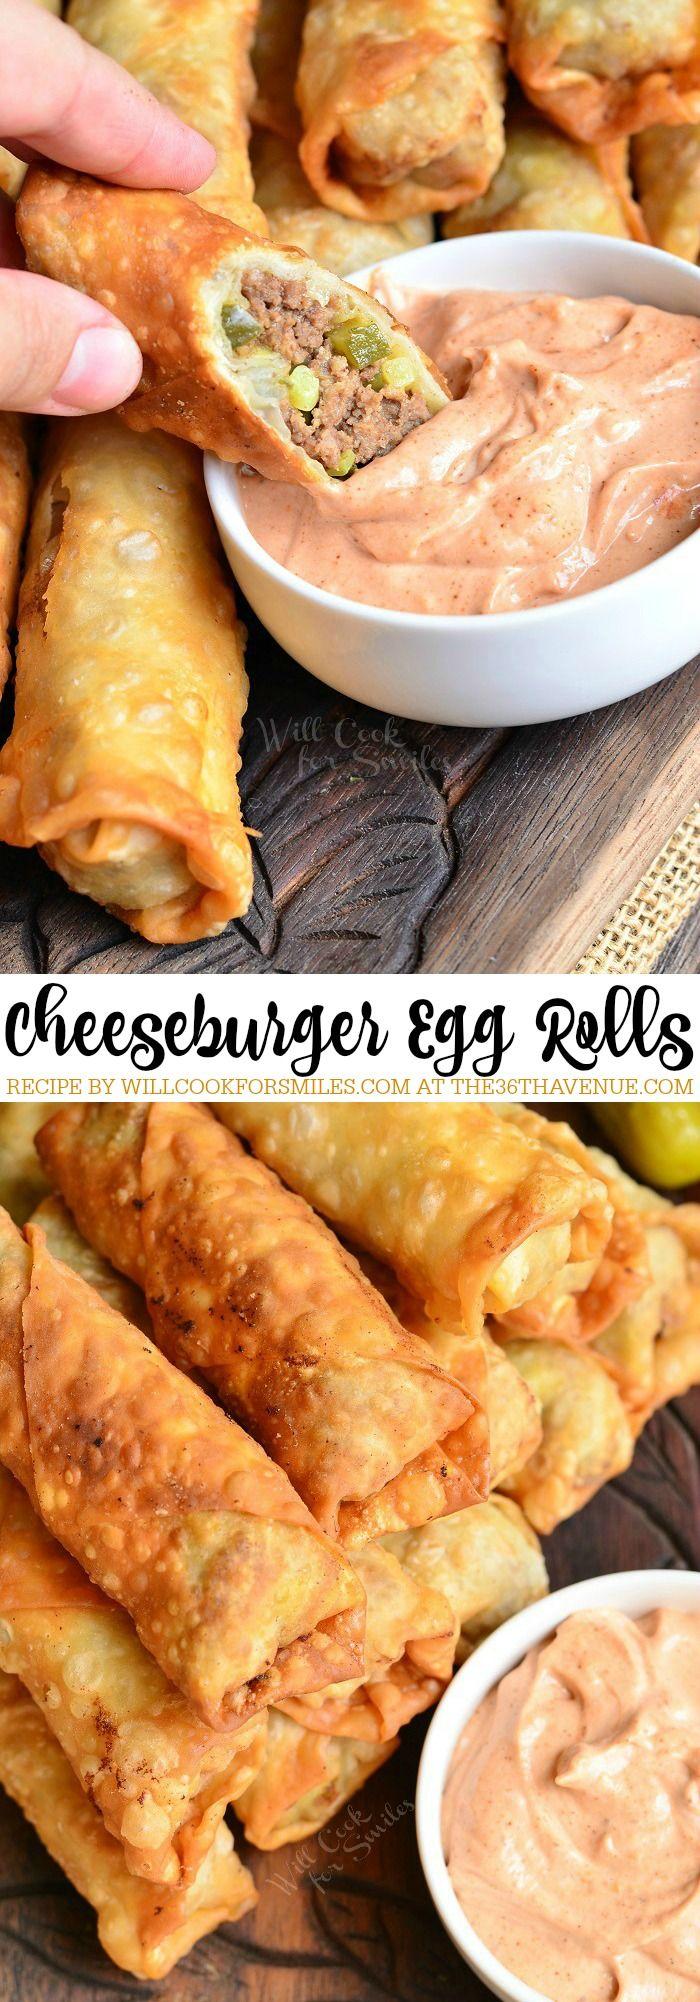 The 36th Avenue Cheeseburger Egg Rolls Recipes Fair Food Recipes Football Food